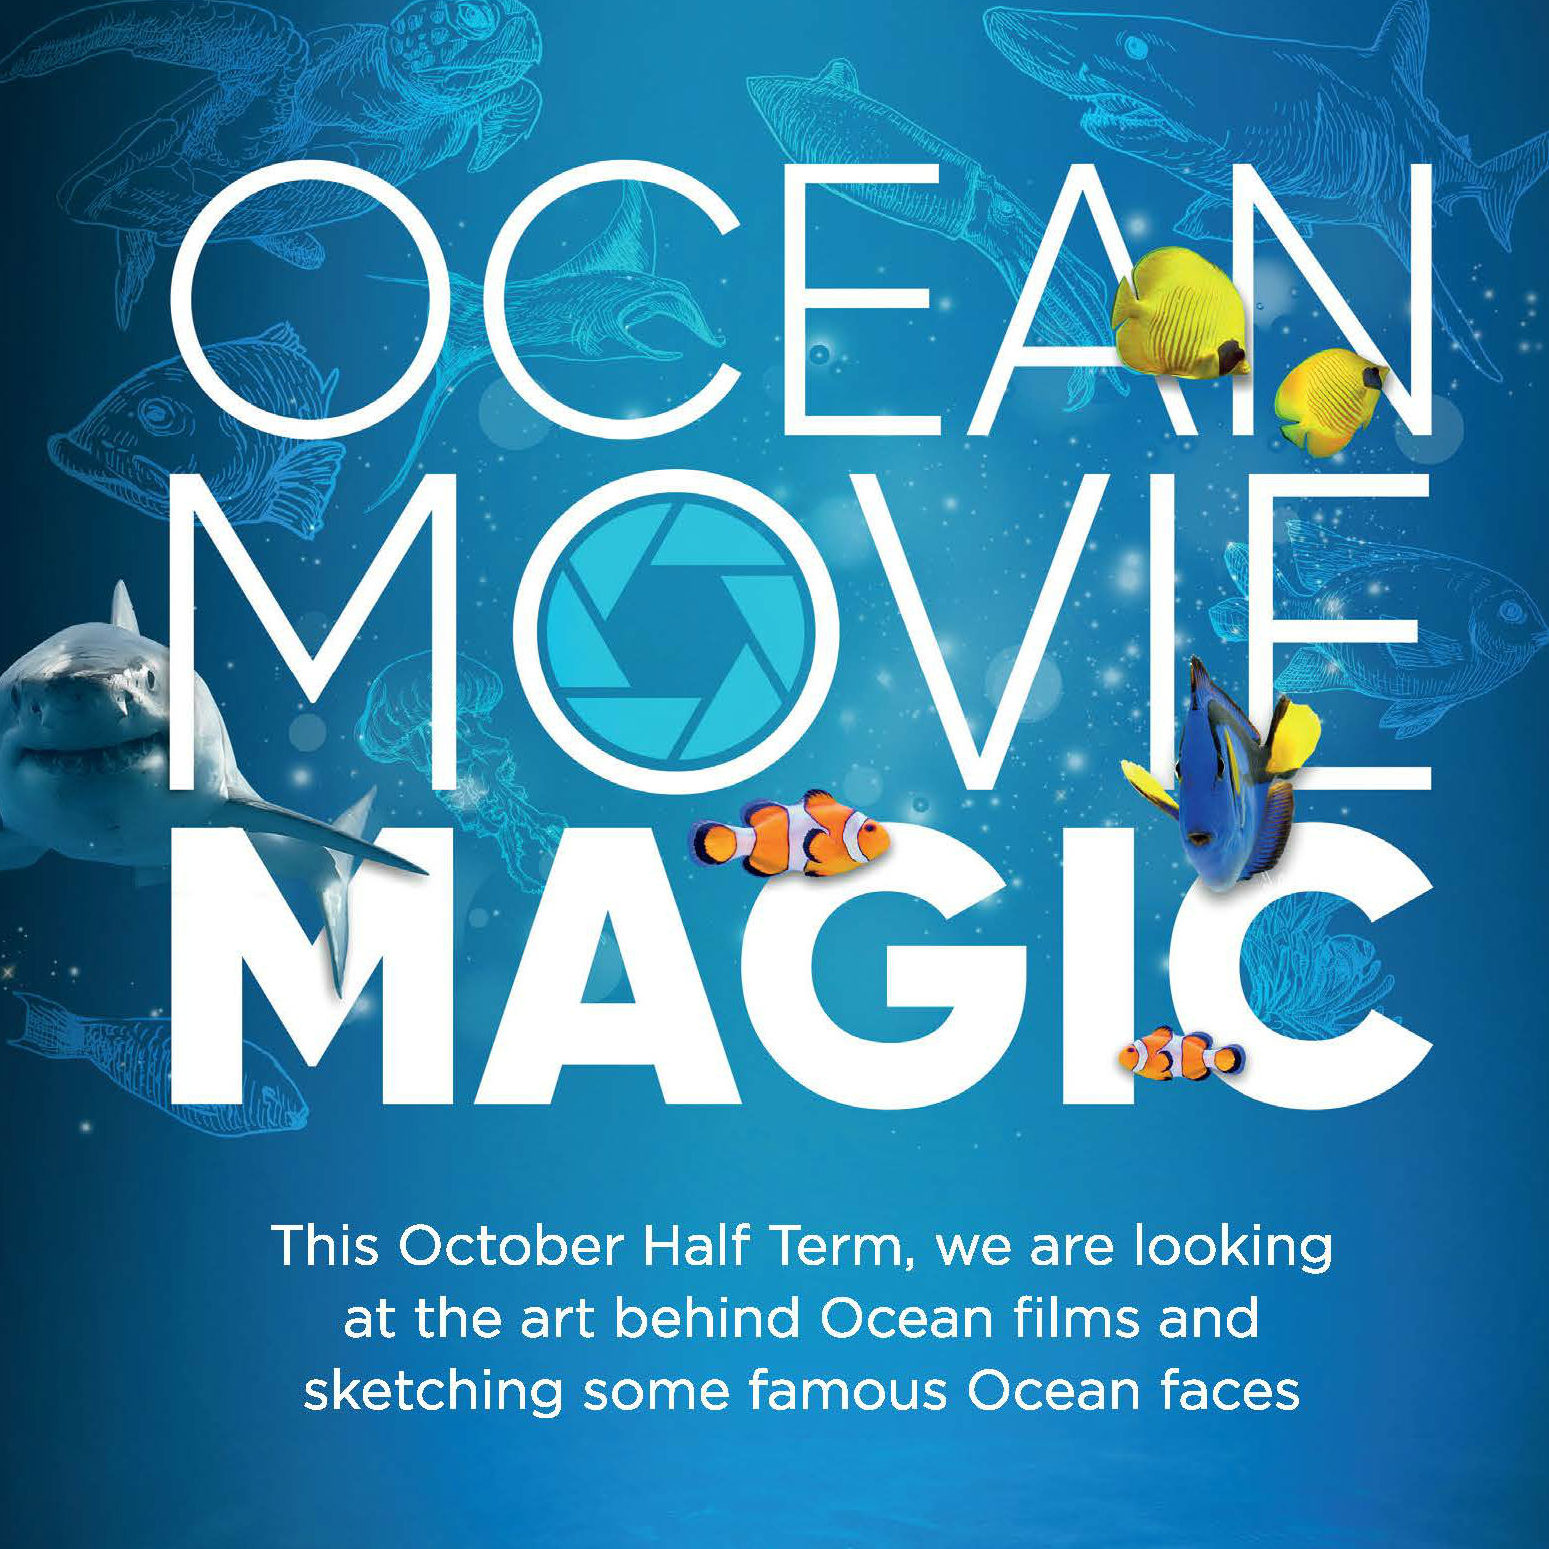 October Half Term Ocean Movie Magic